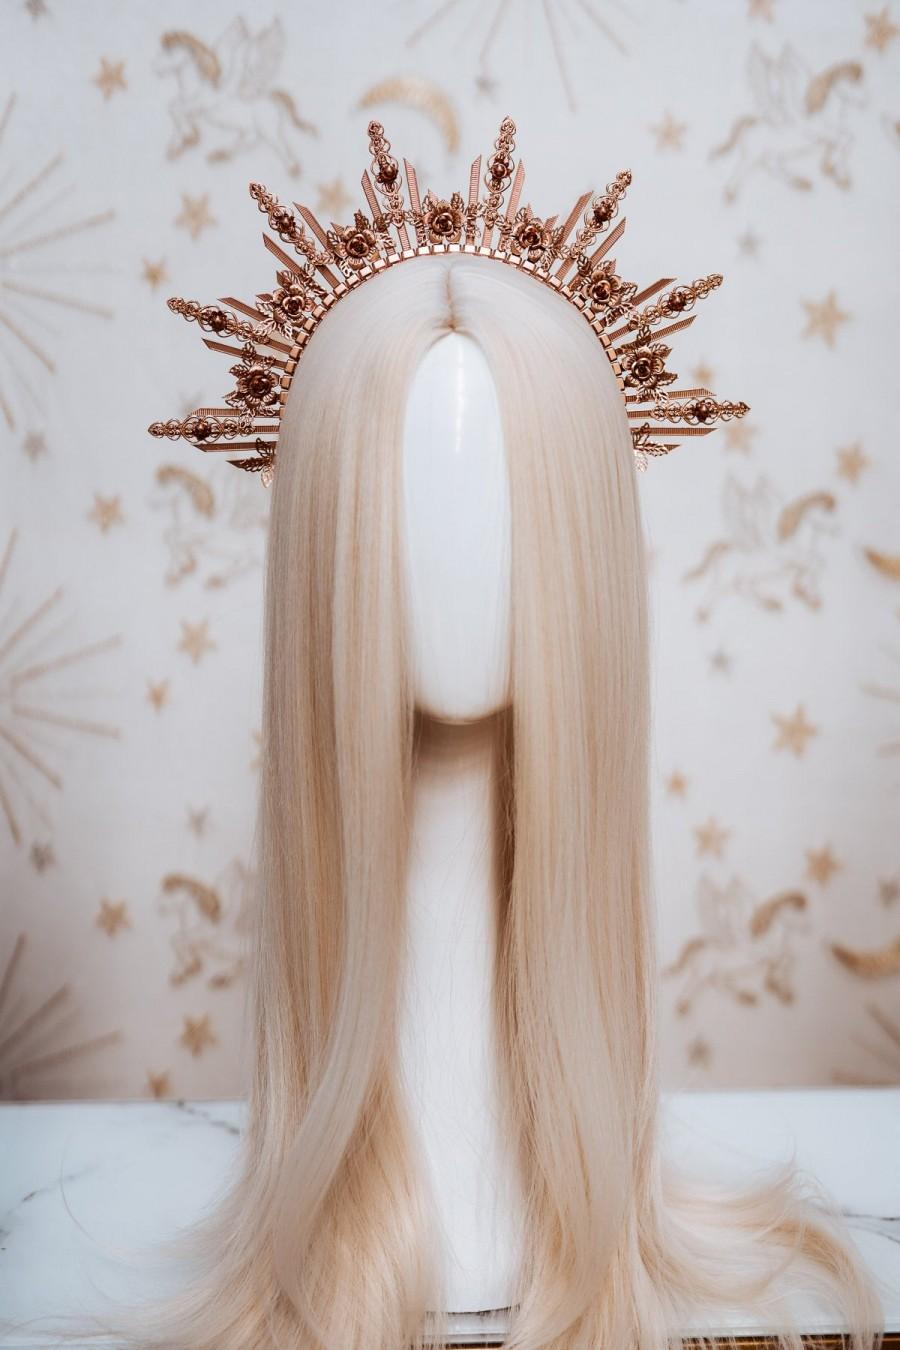 Wedding - Sun crown, Flower Crown, Halo Crown, Halo Headpiece, Halo Headband, Halo Headlights, Rose Gold Halo, Headpiece, Wedding Crown, Boho Flowers